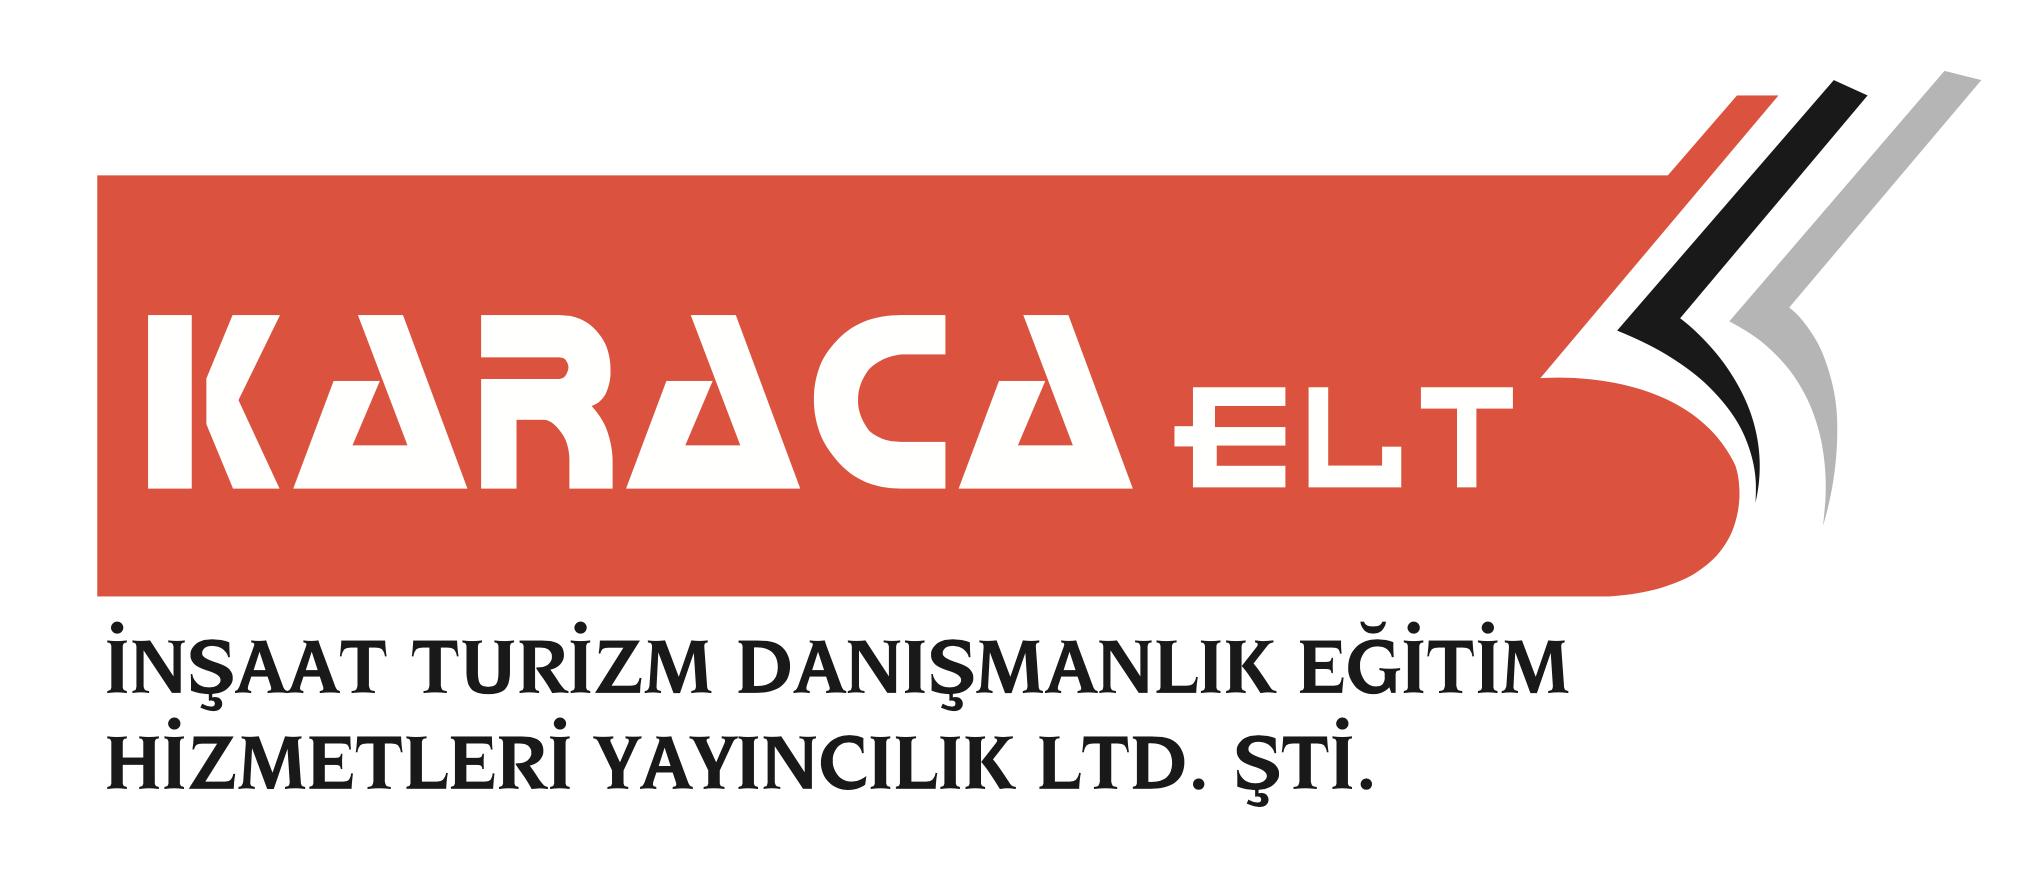 karacaelt.com